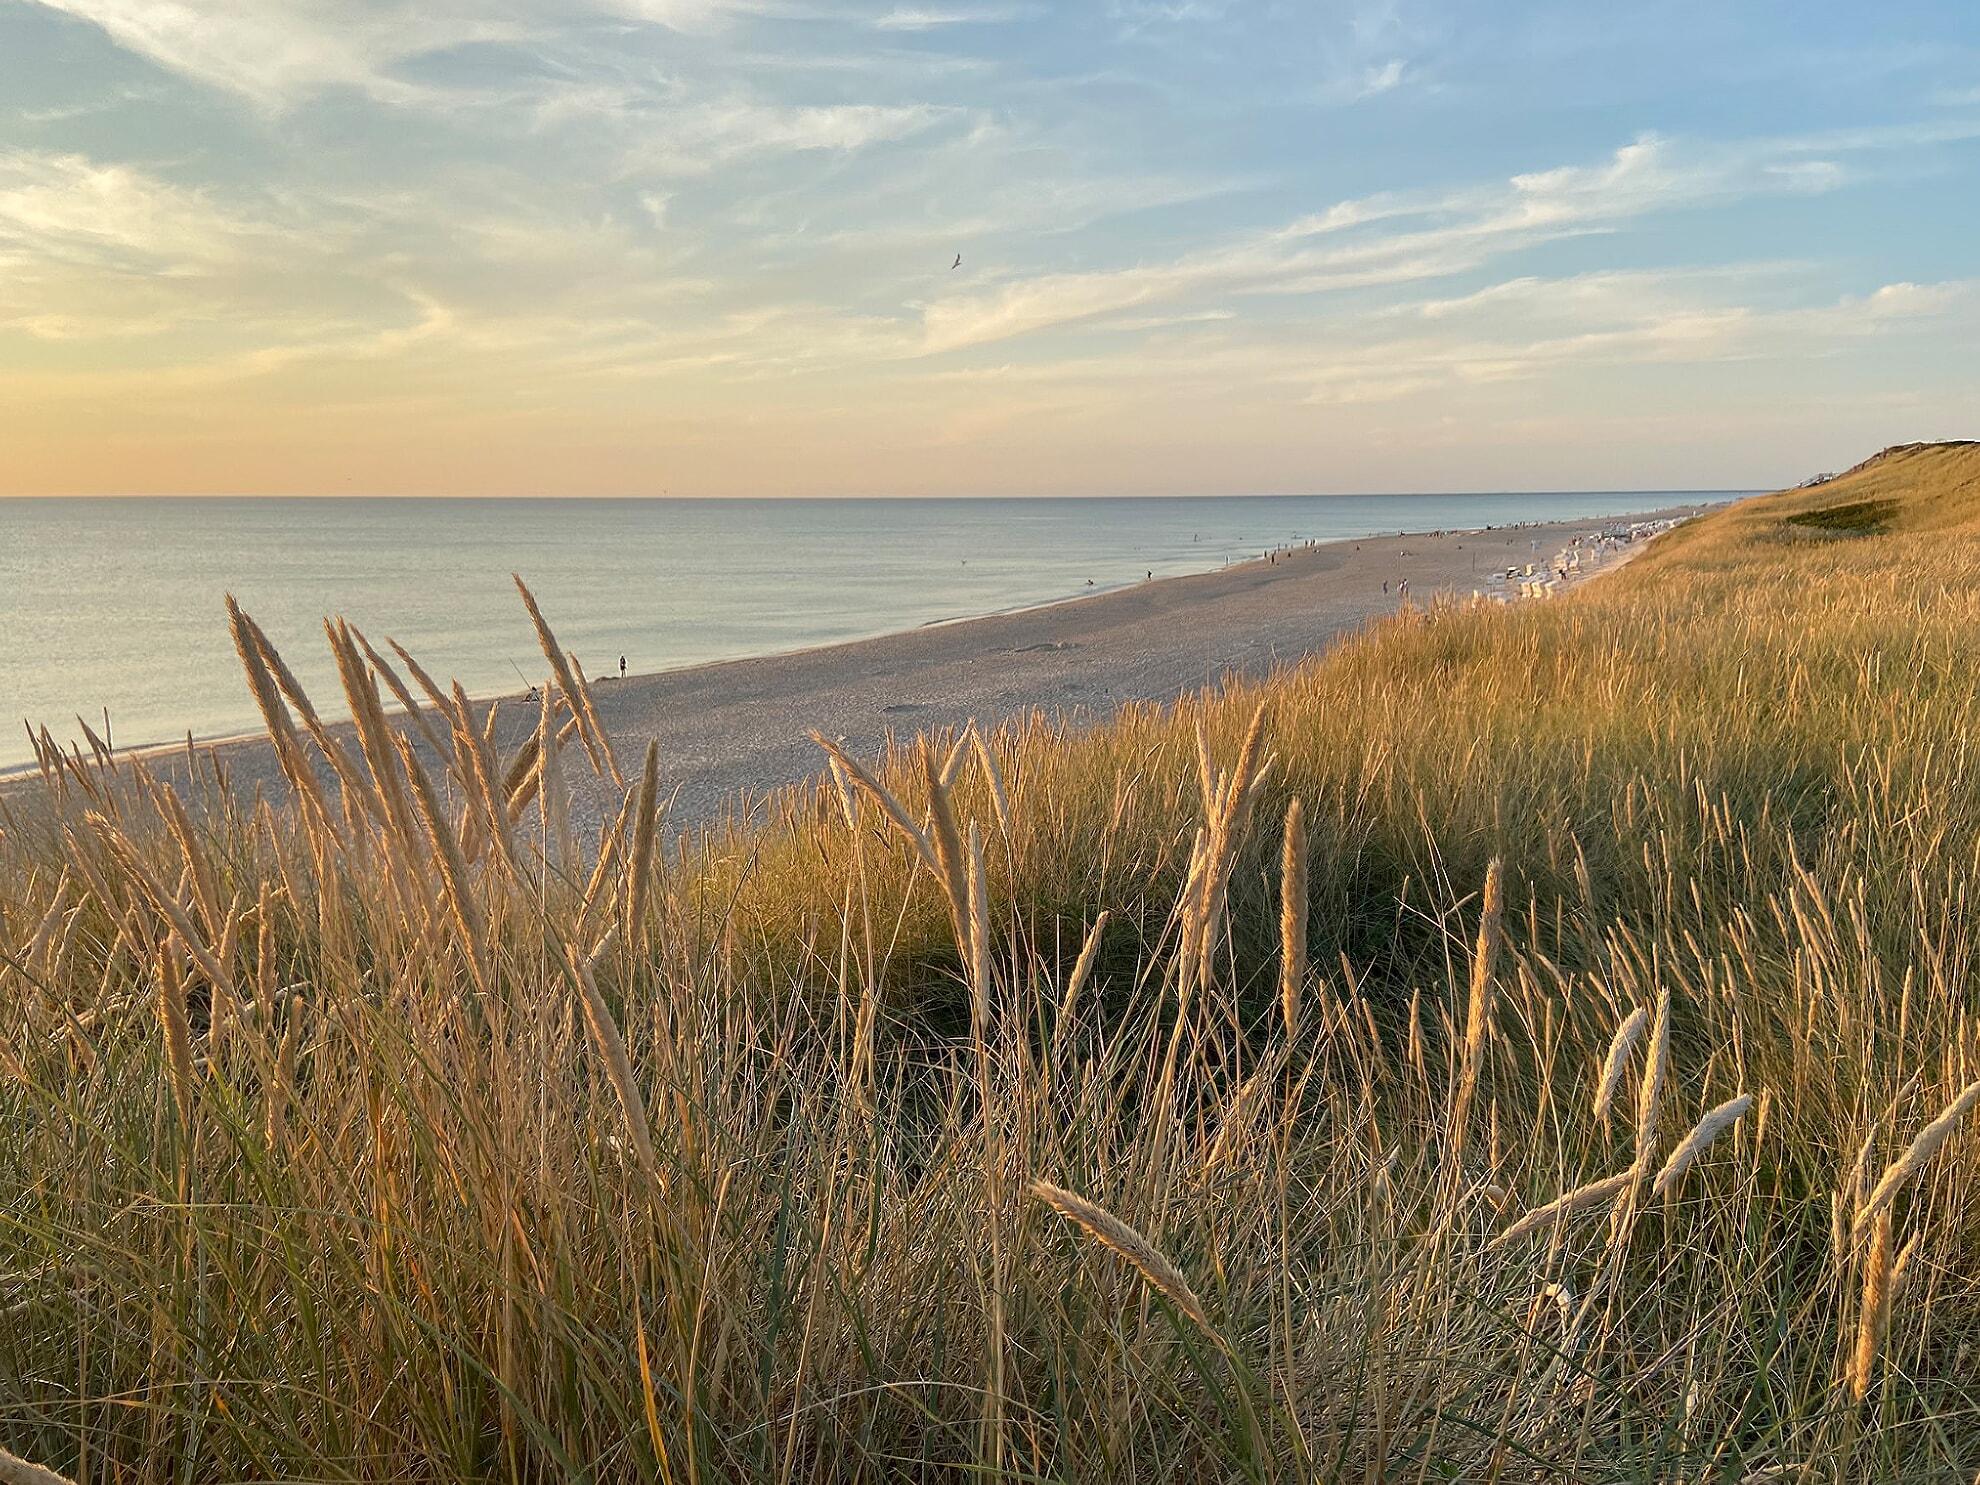 FKK-Strand an der Nordseeklinik